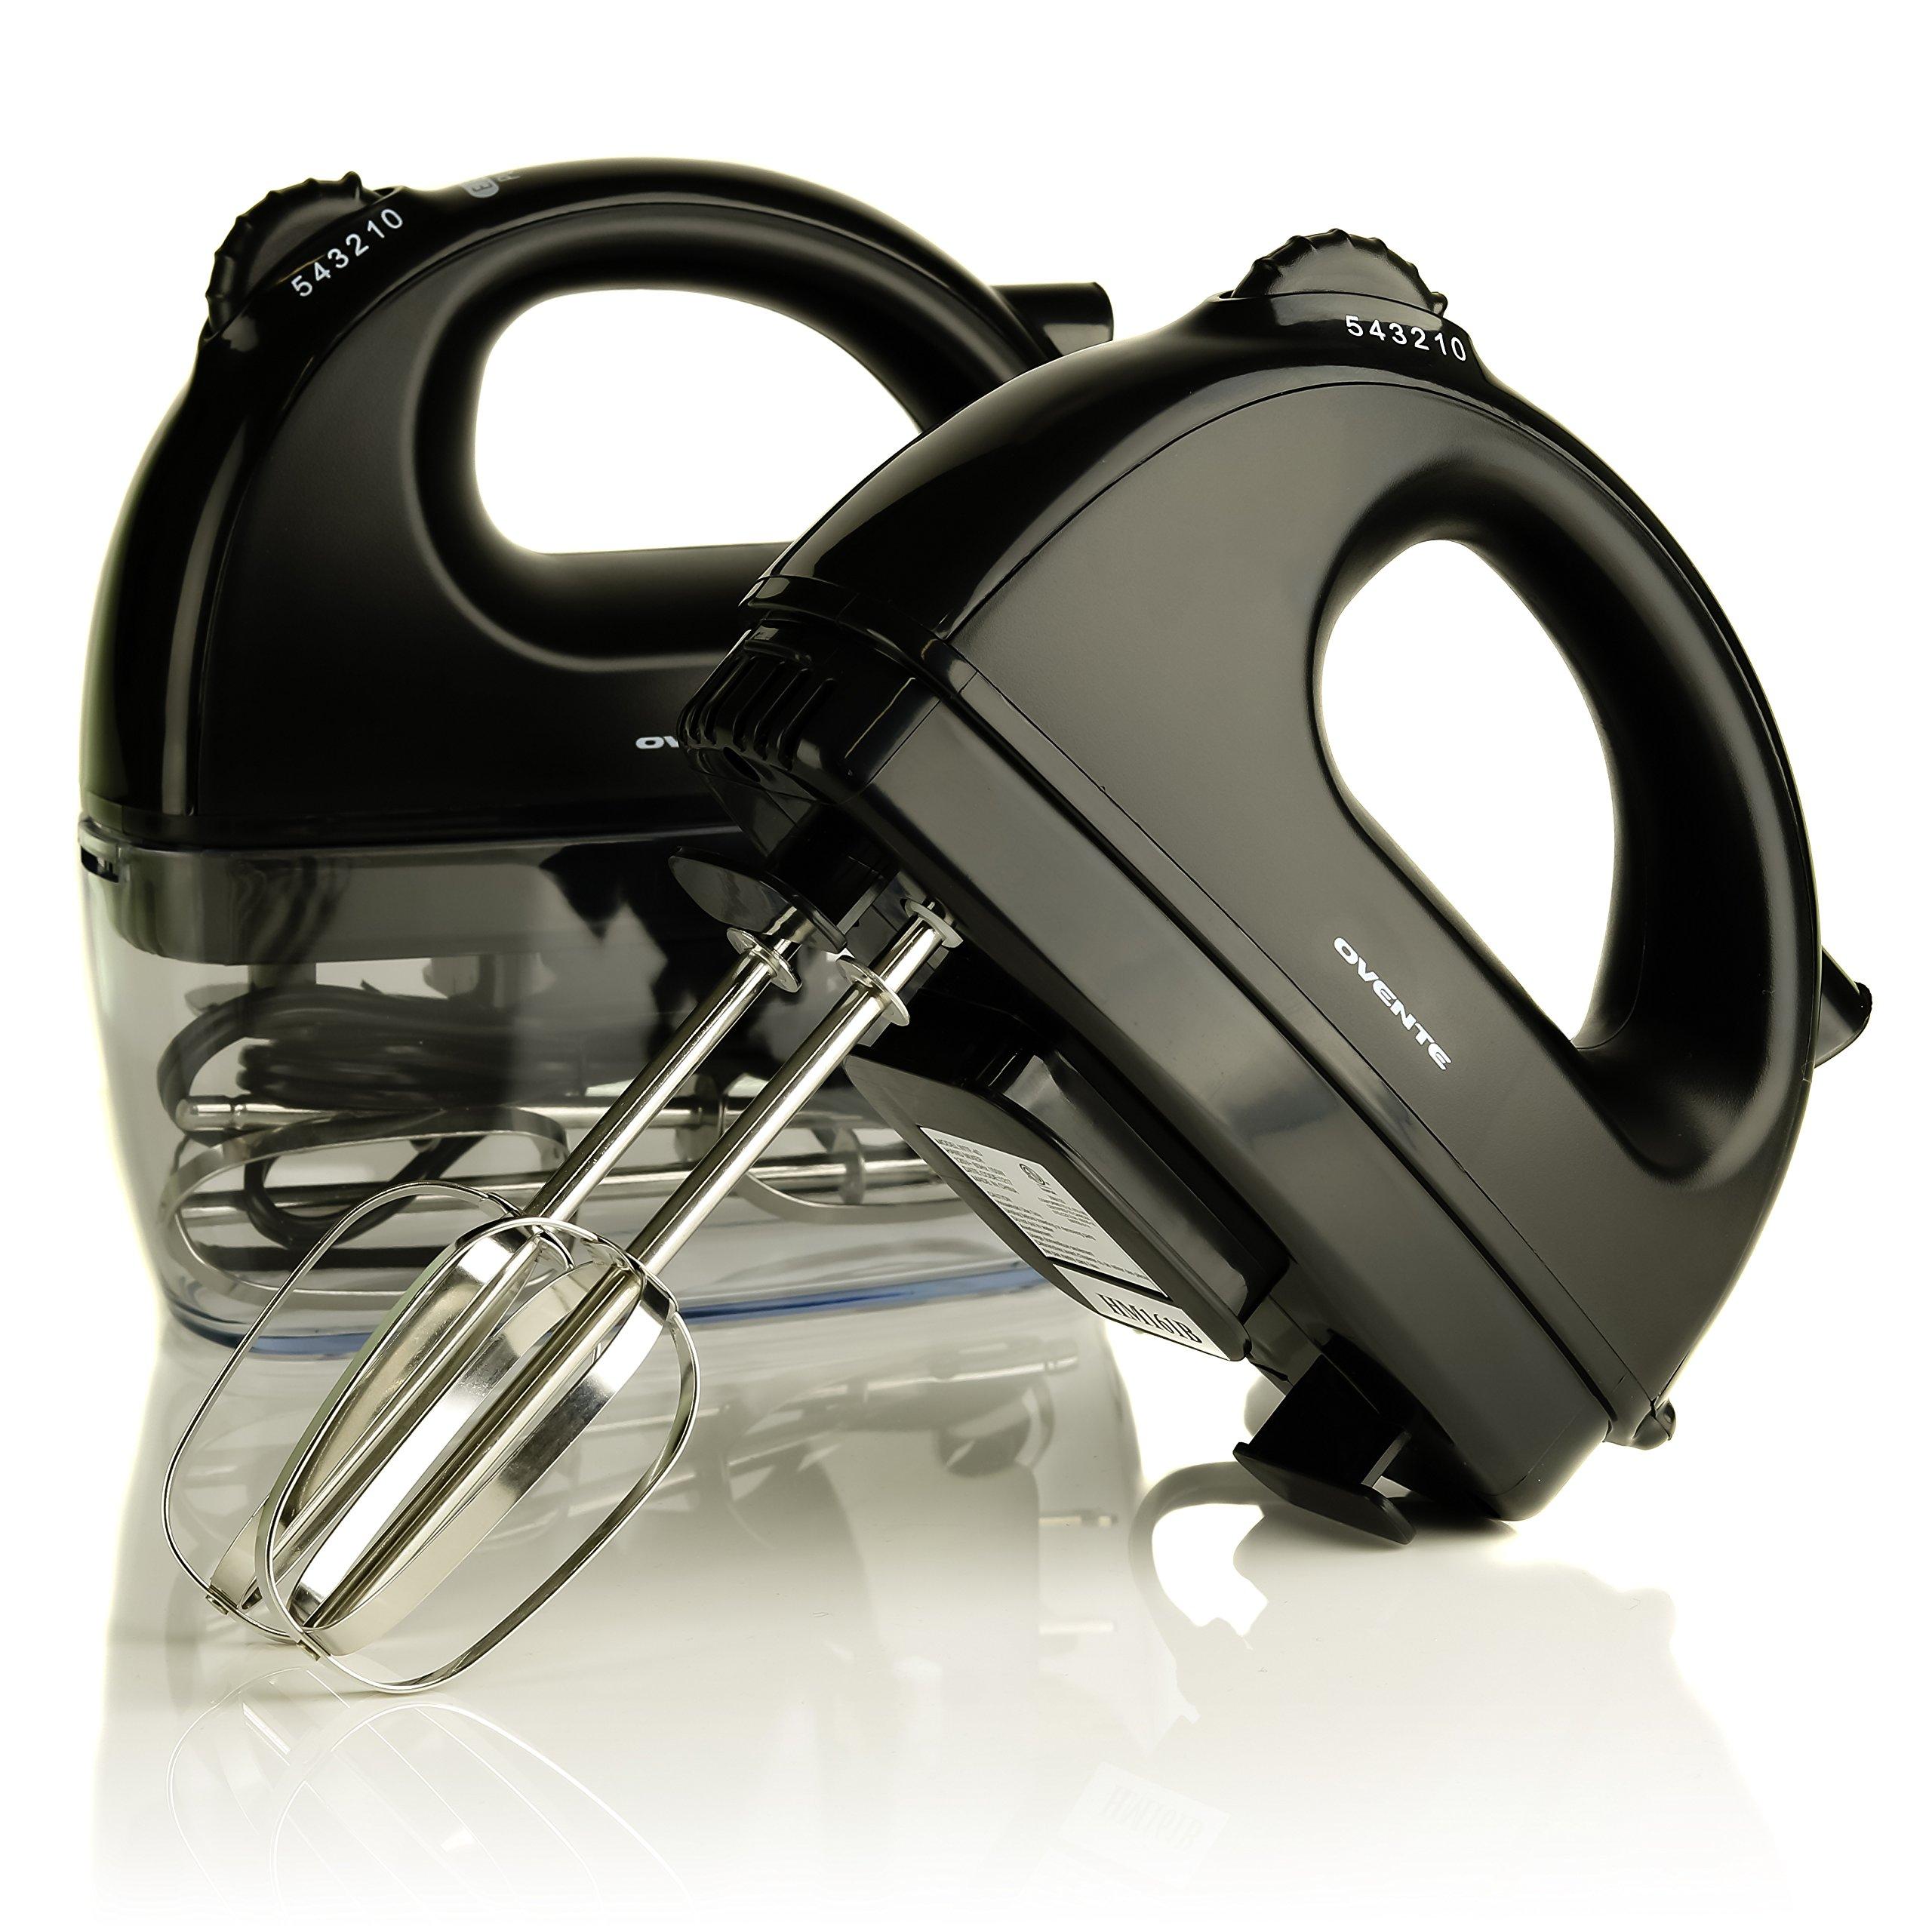 Ovente HM161B Hand Mixer, Ultra Power 5-Speed